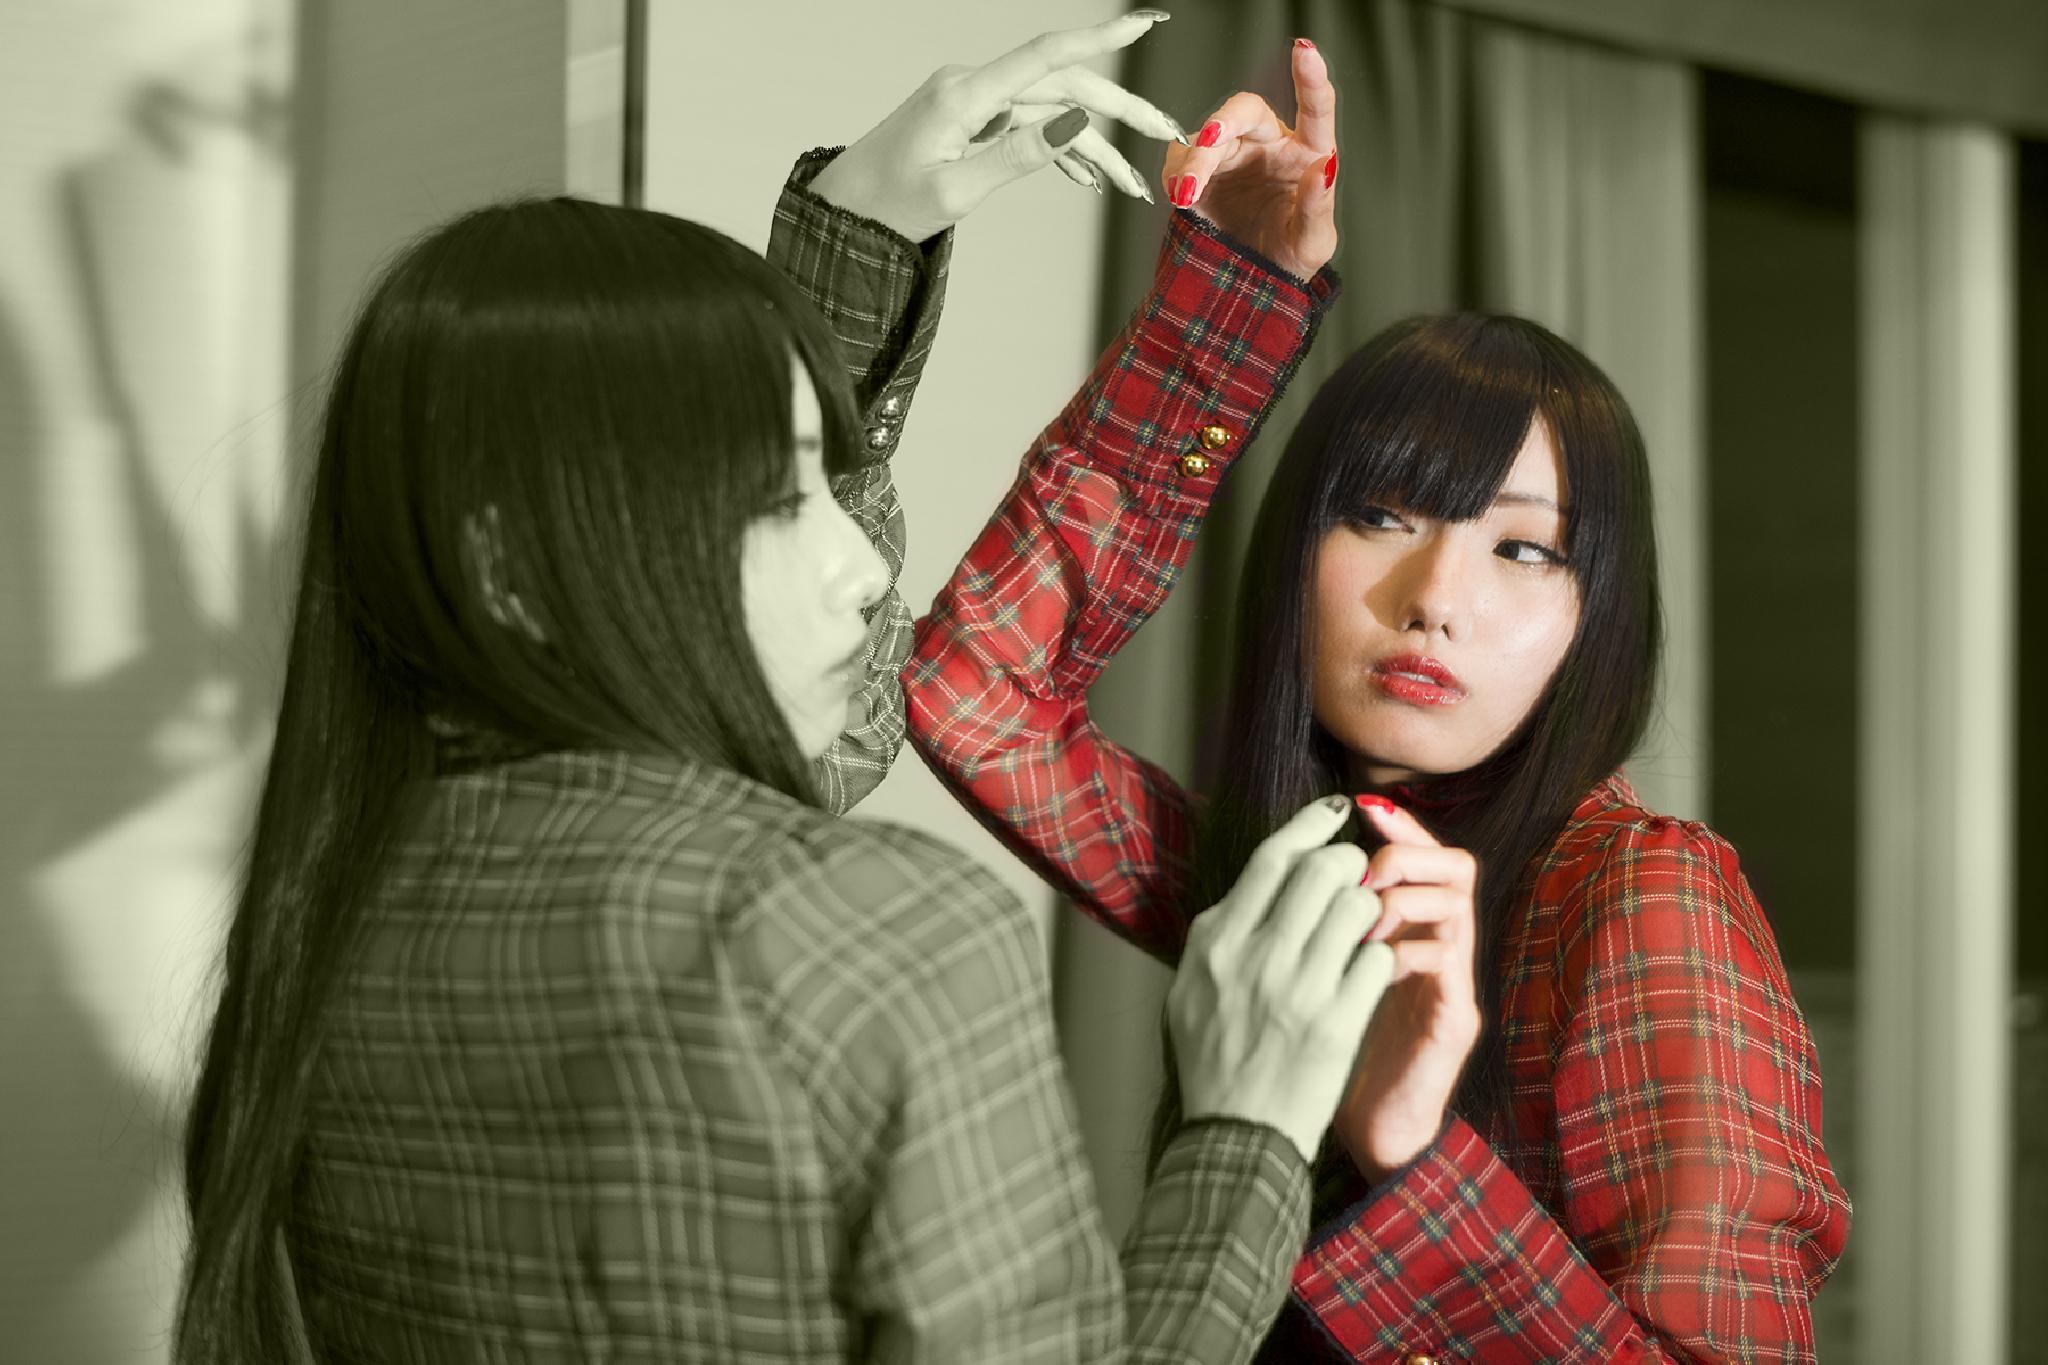 Såsom i en spegel by SquareOne